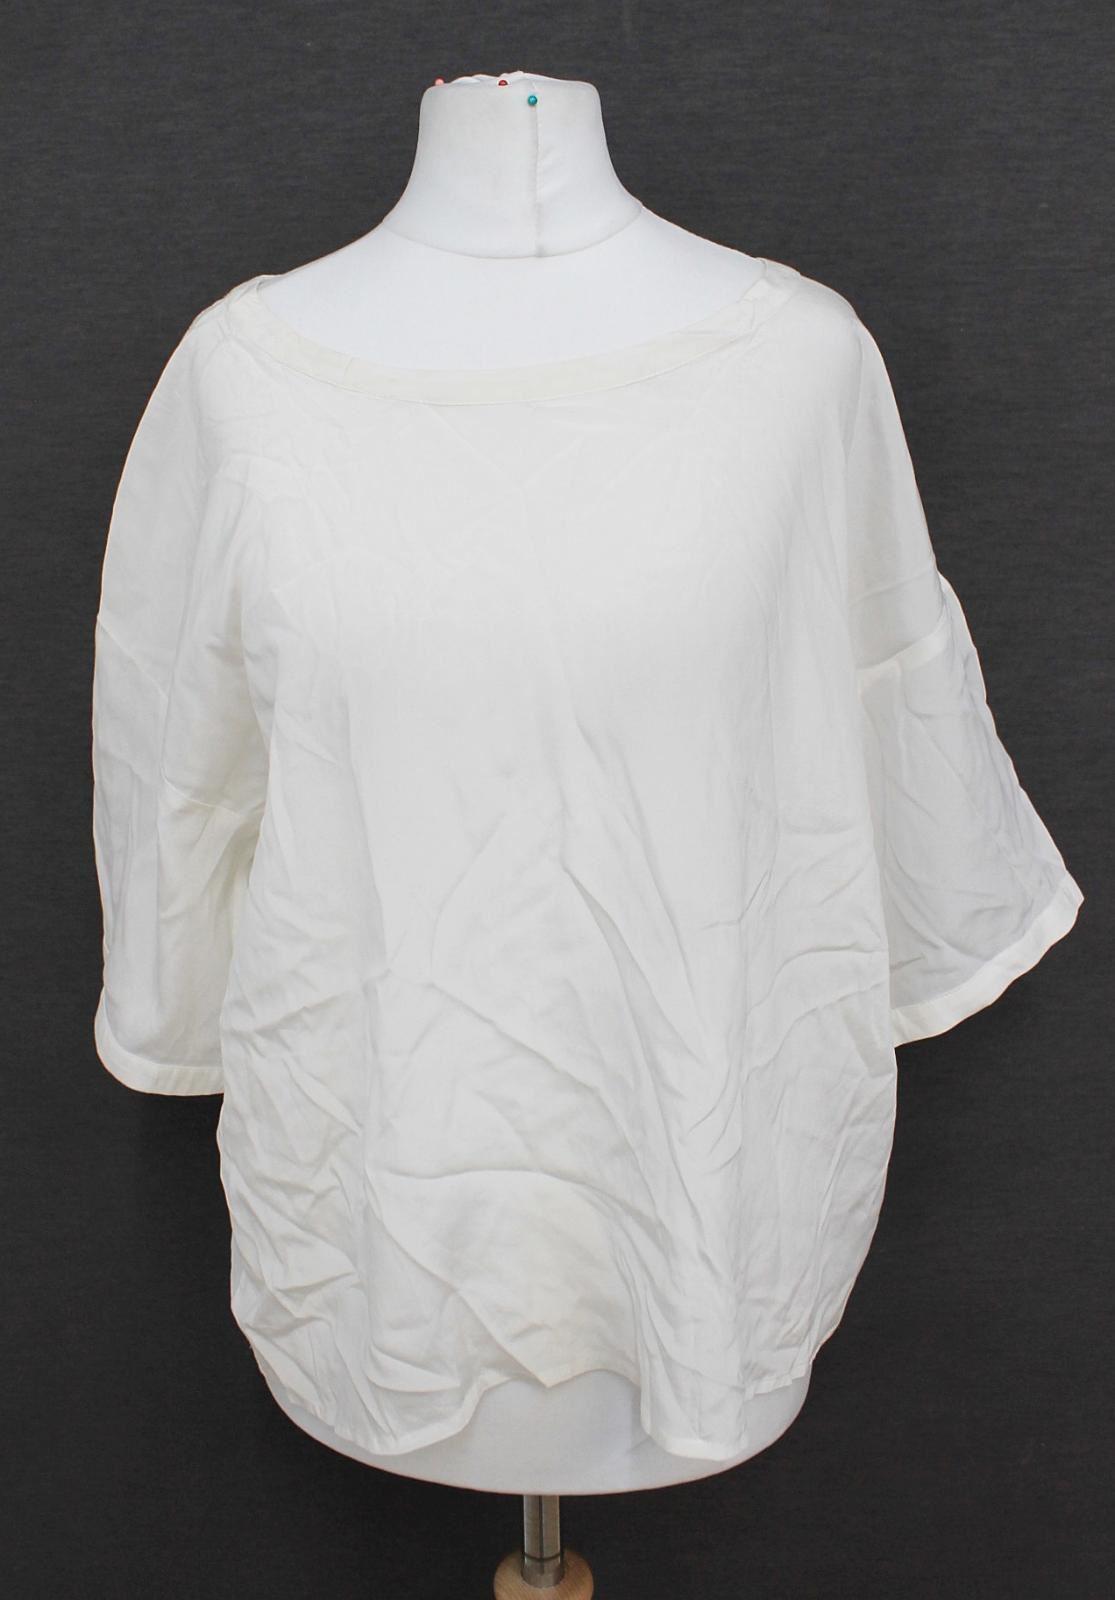 DKNY-DONNA-KARAN-NEW-YORK-Ladies-Ivory-Short-Sleeved-Oversized-Blouse-Size-S